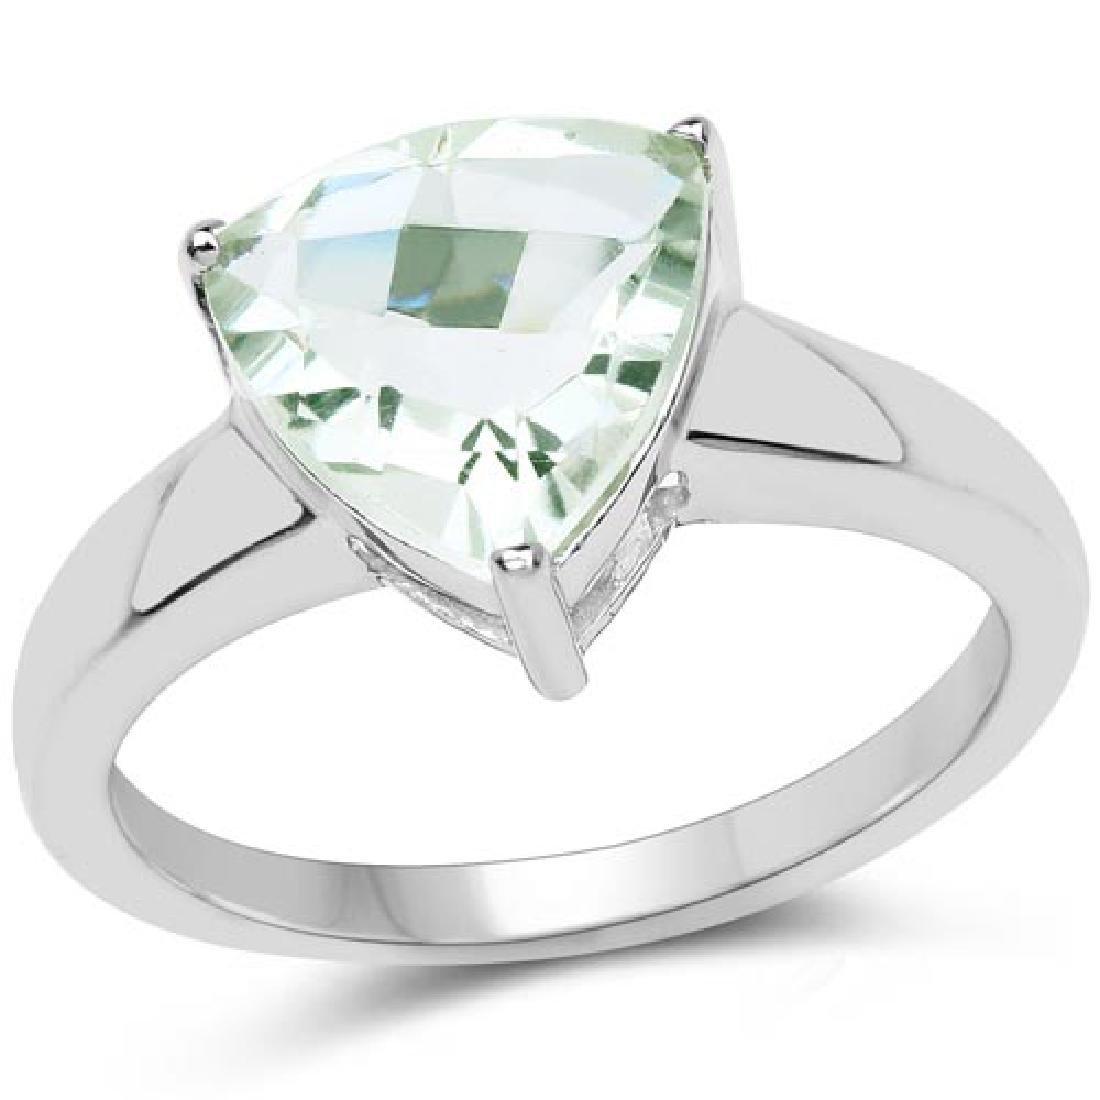 2.25 Carat Genuine Green Amethyst .925 Sterling Silver